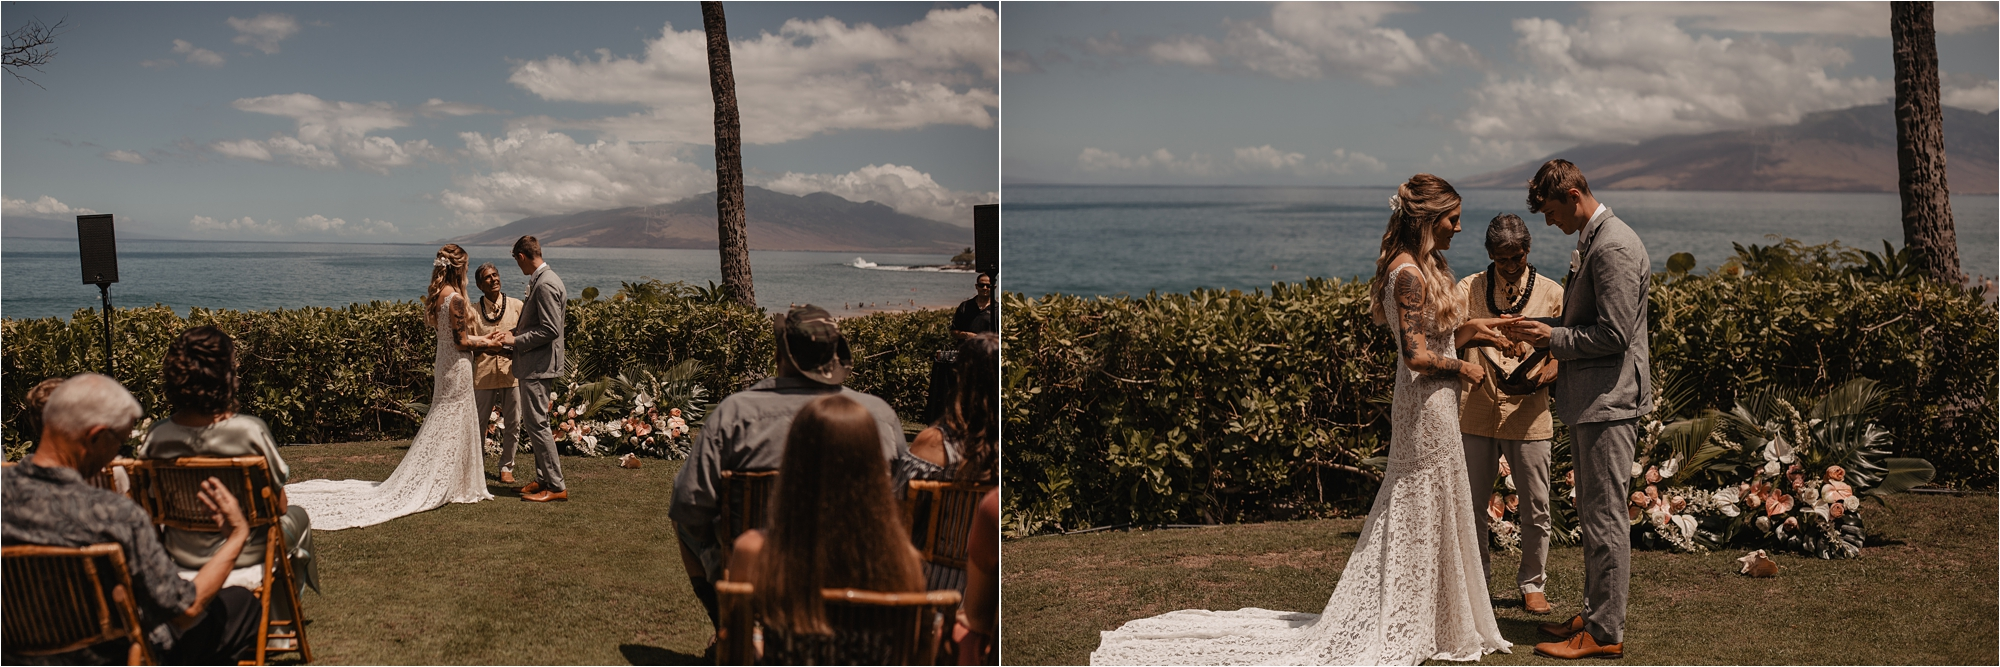 maui-hawaii-intimate-tropical-wedding_0036.jpg